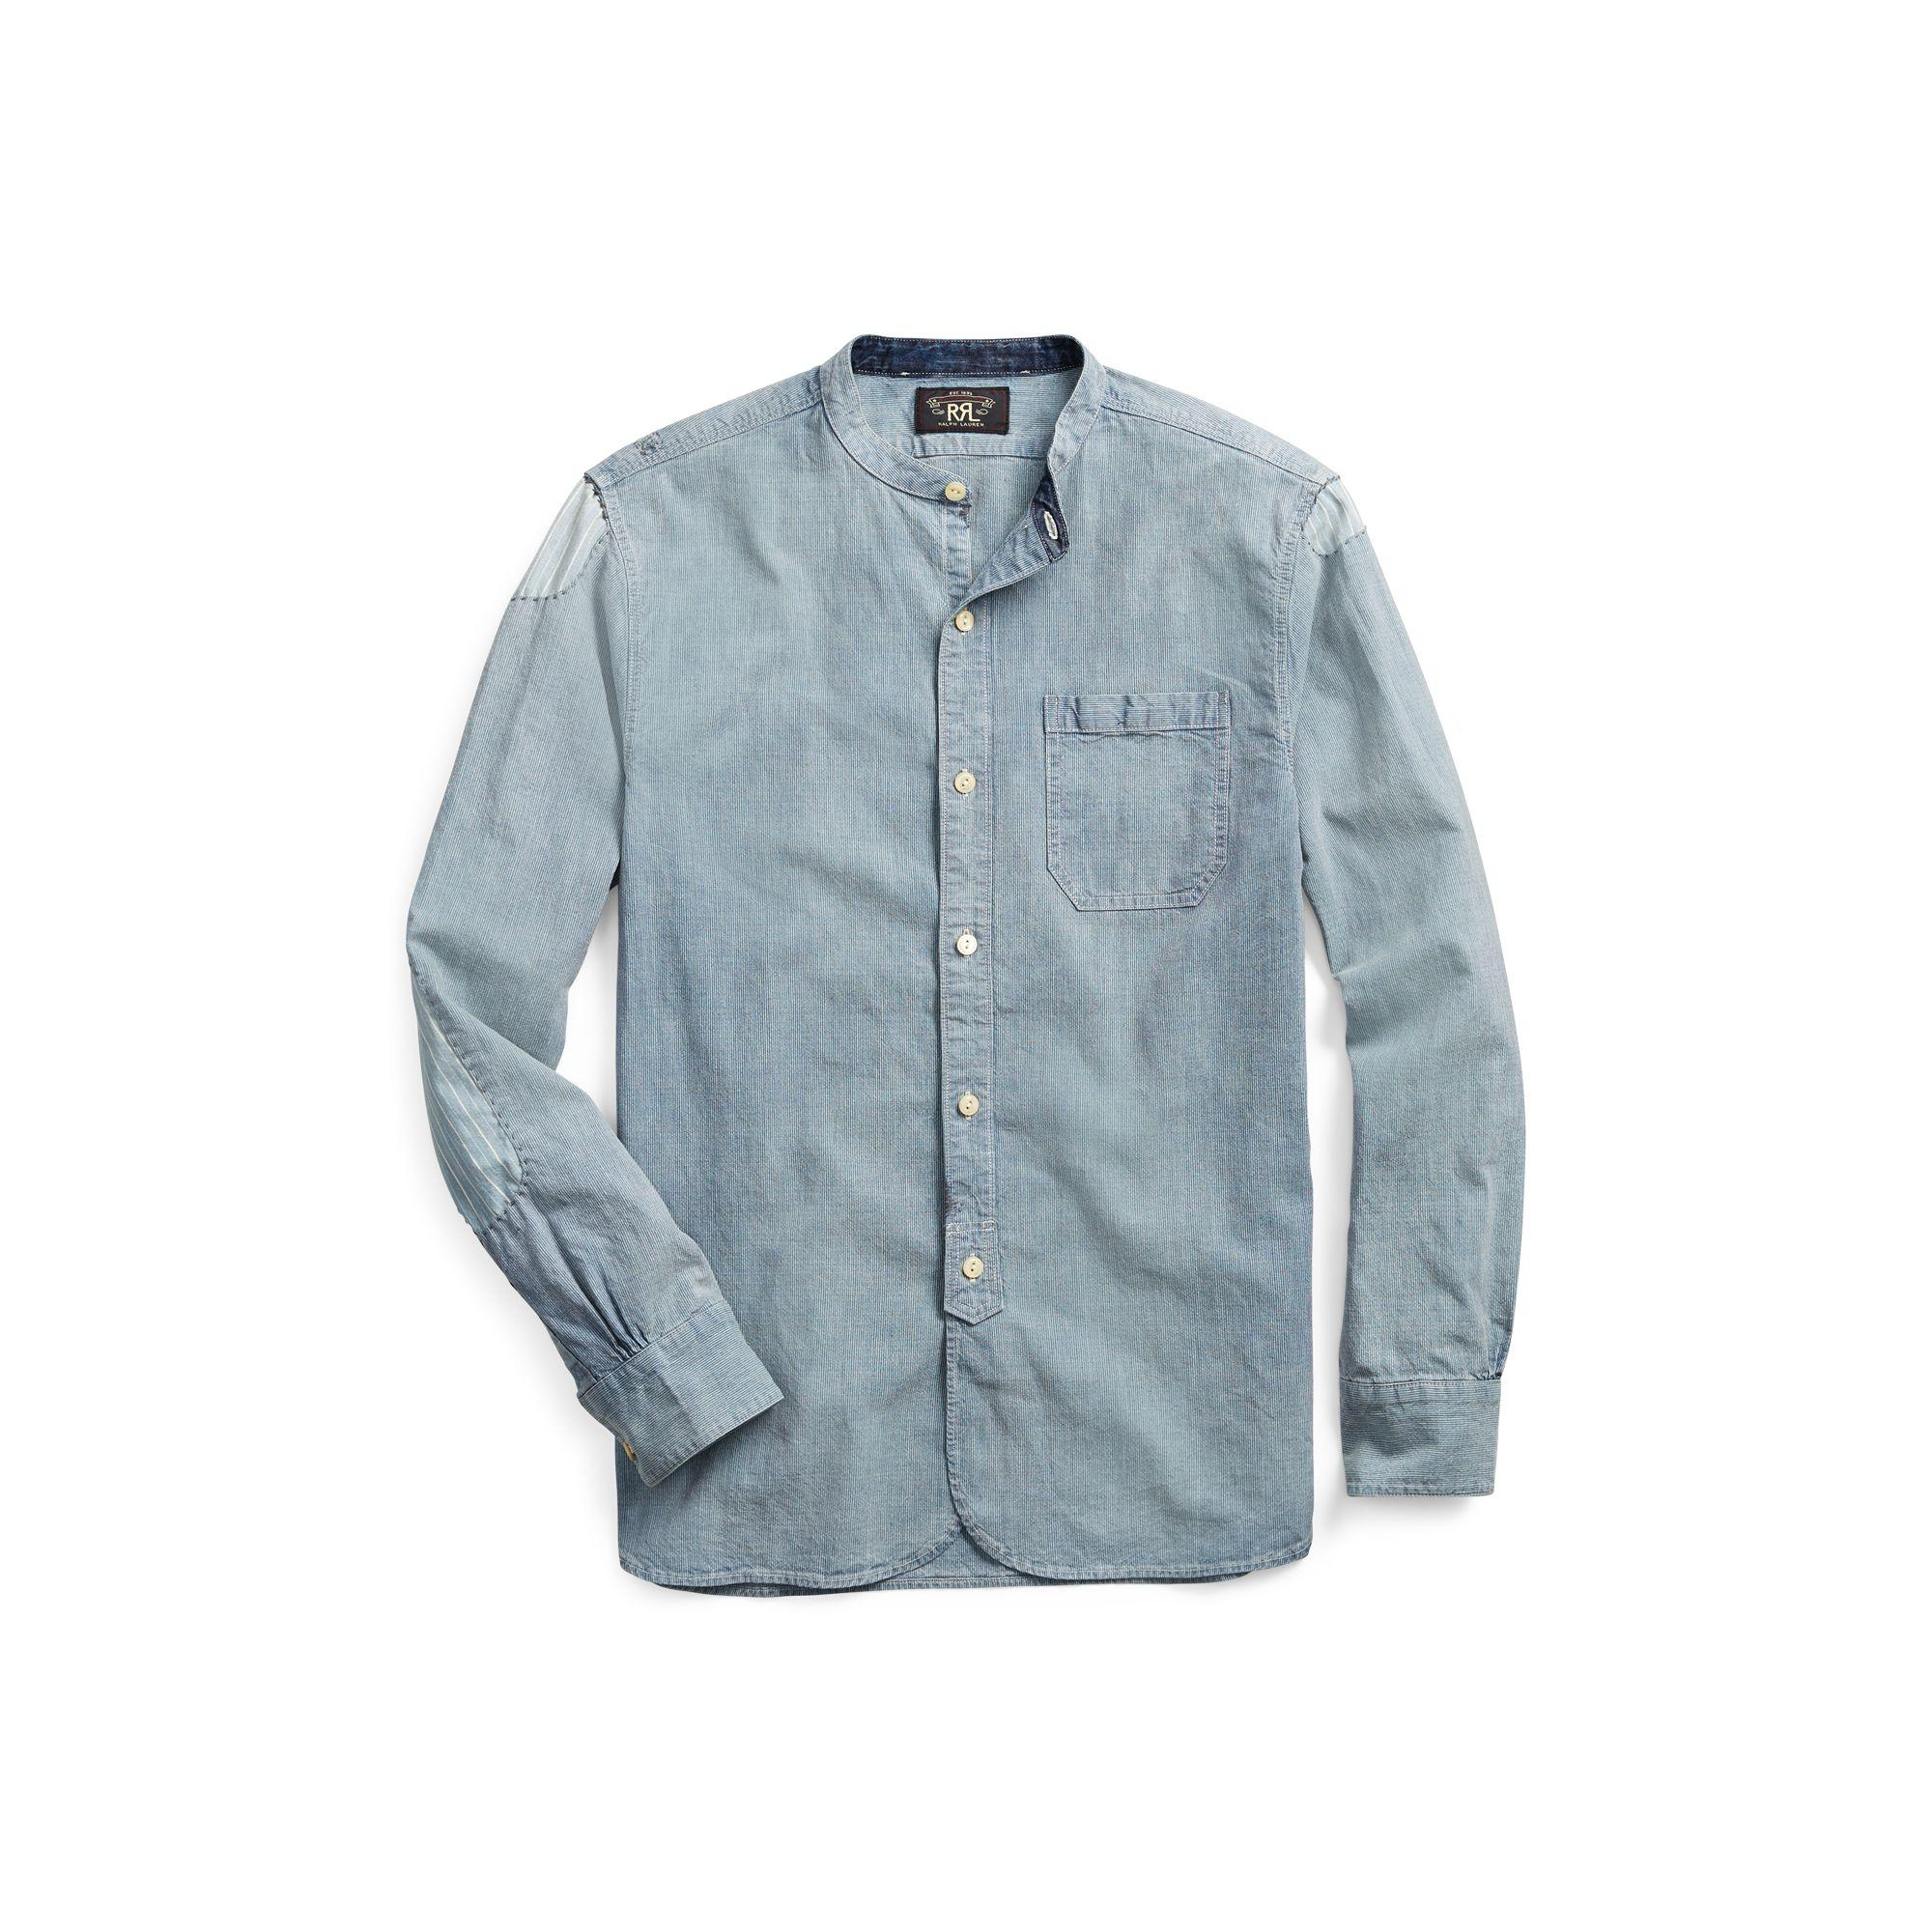 f757737b58 Lyst - RRL Striped Cotton-linen Shirt in Blue for Men